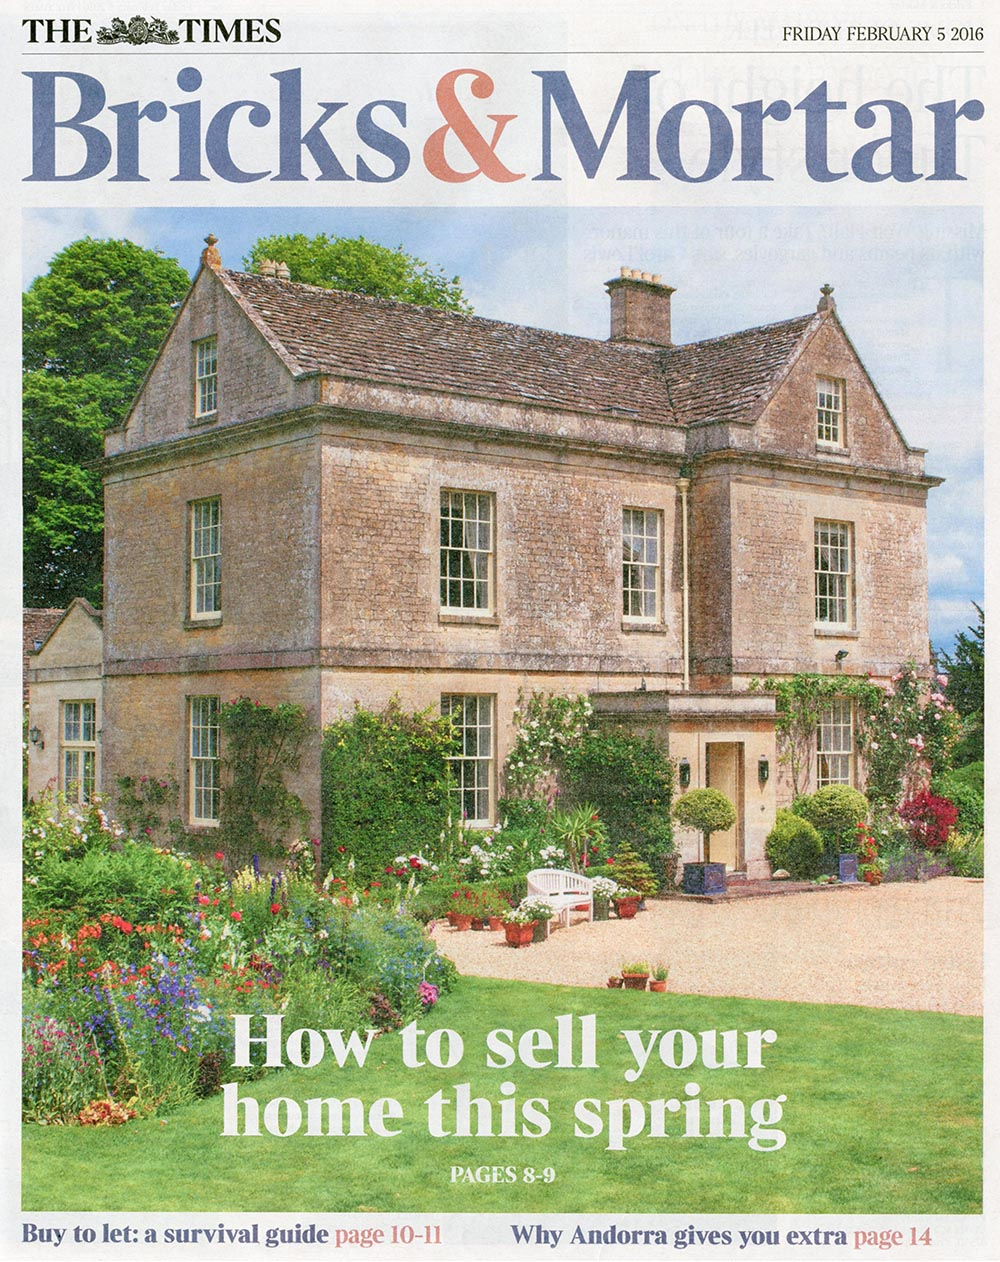 The Times Bricks & Mortar 5 February 2016